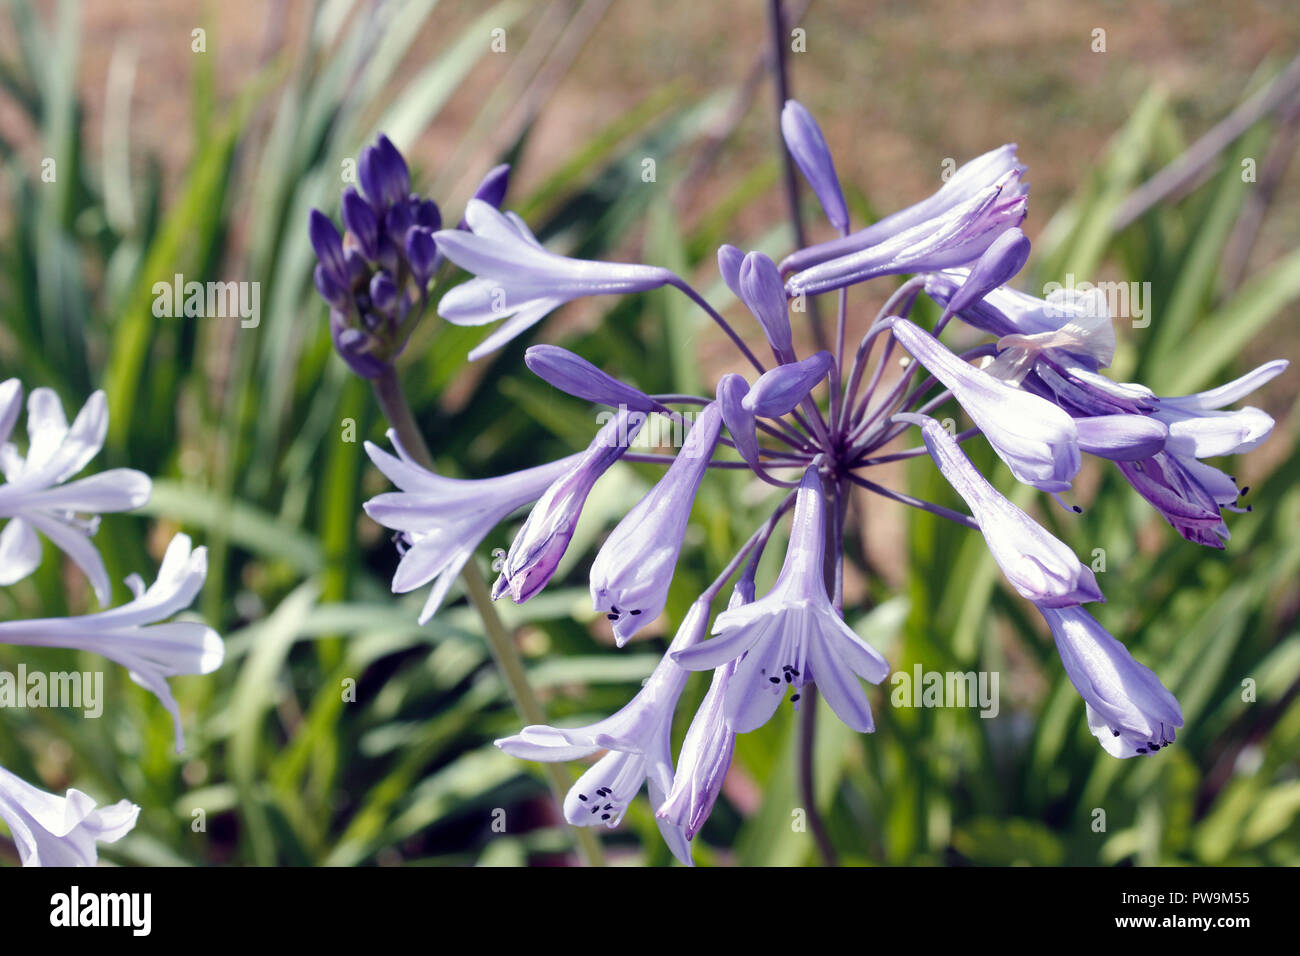 Agapanthus africanus blue flower heads Stock Photo